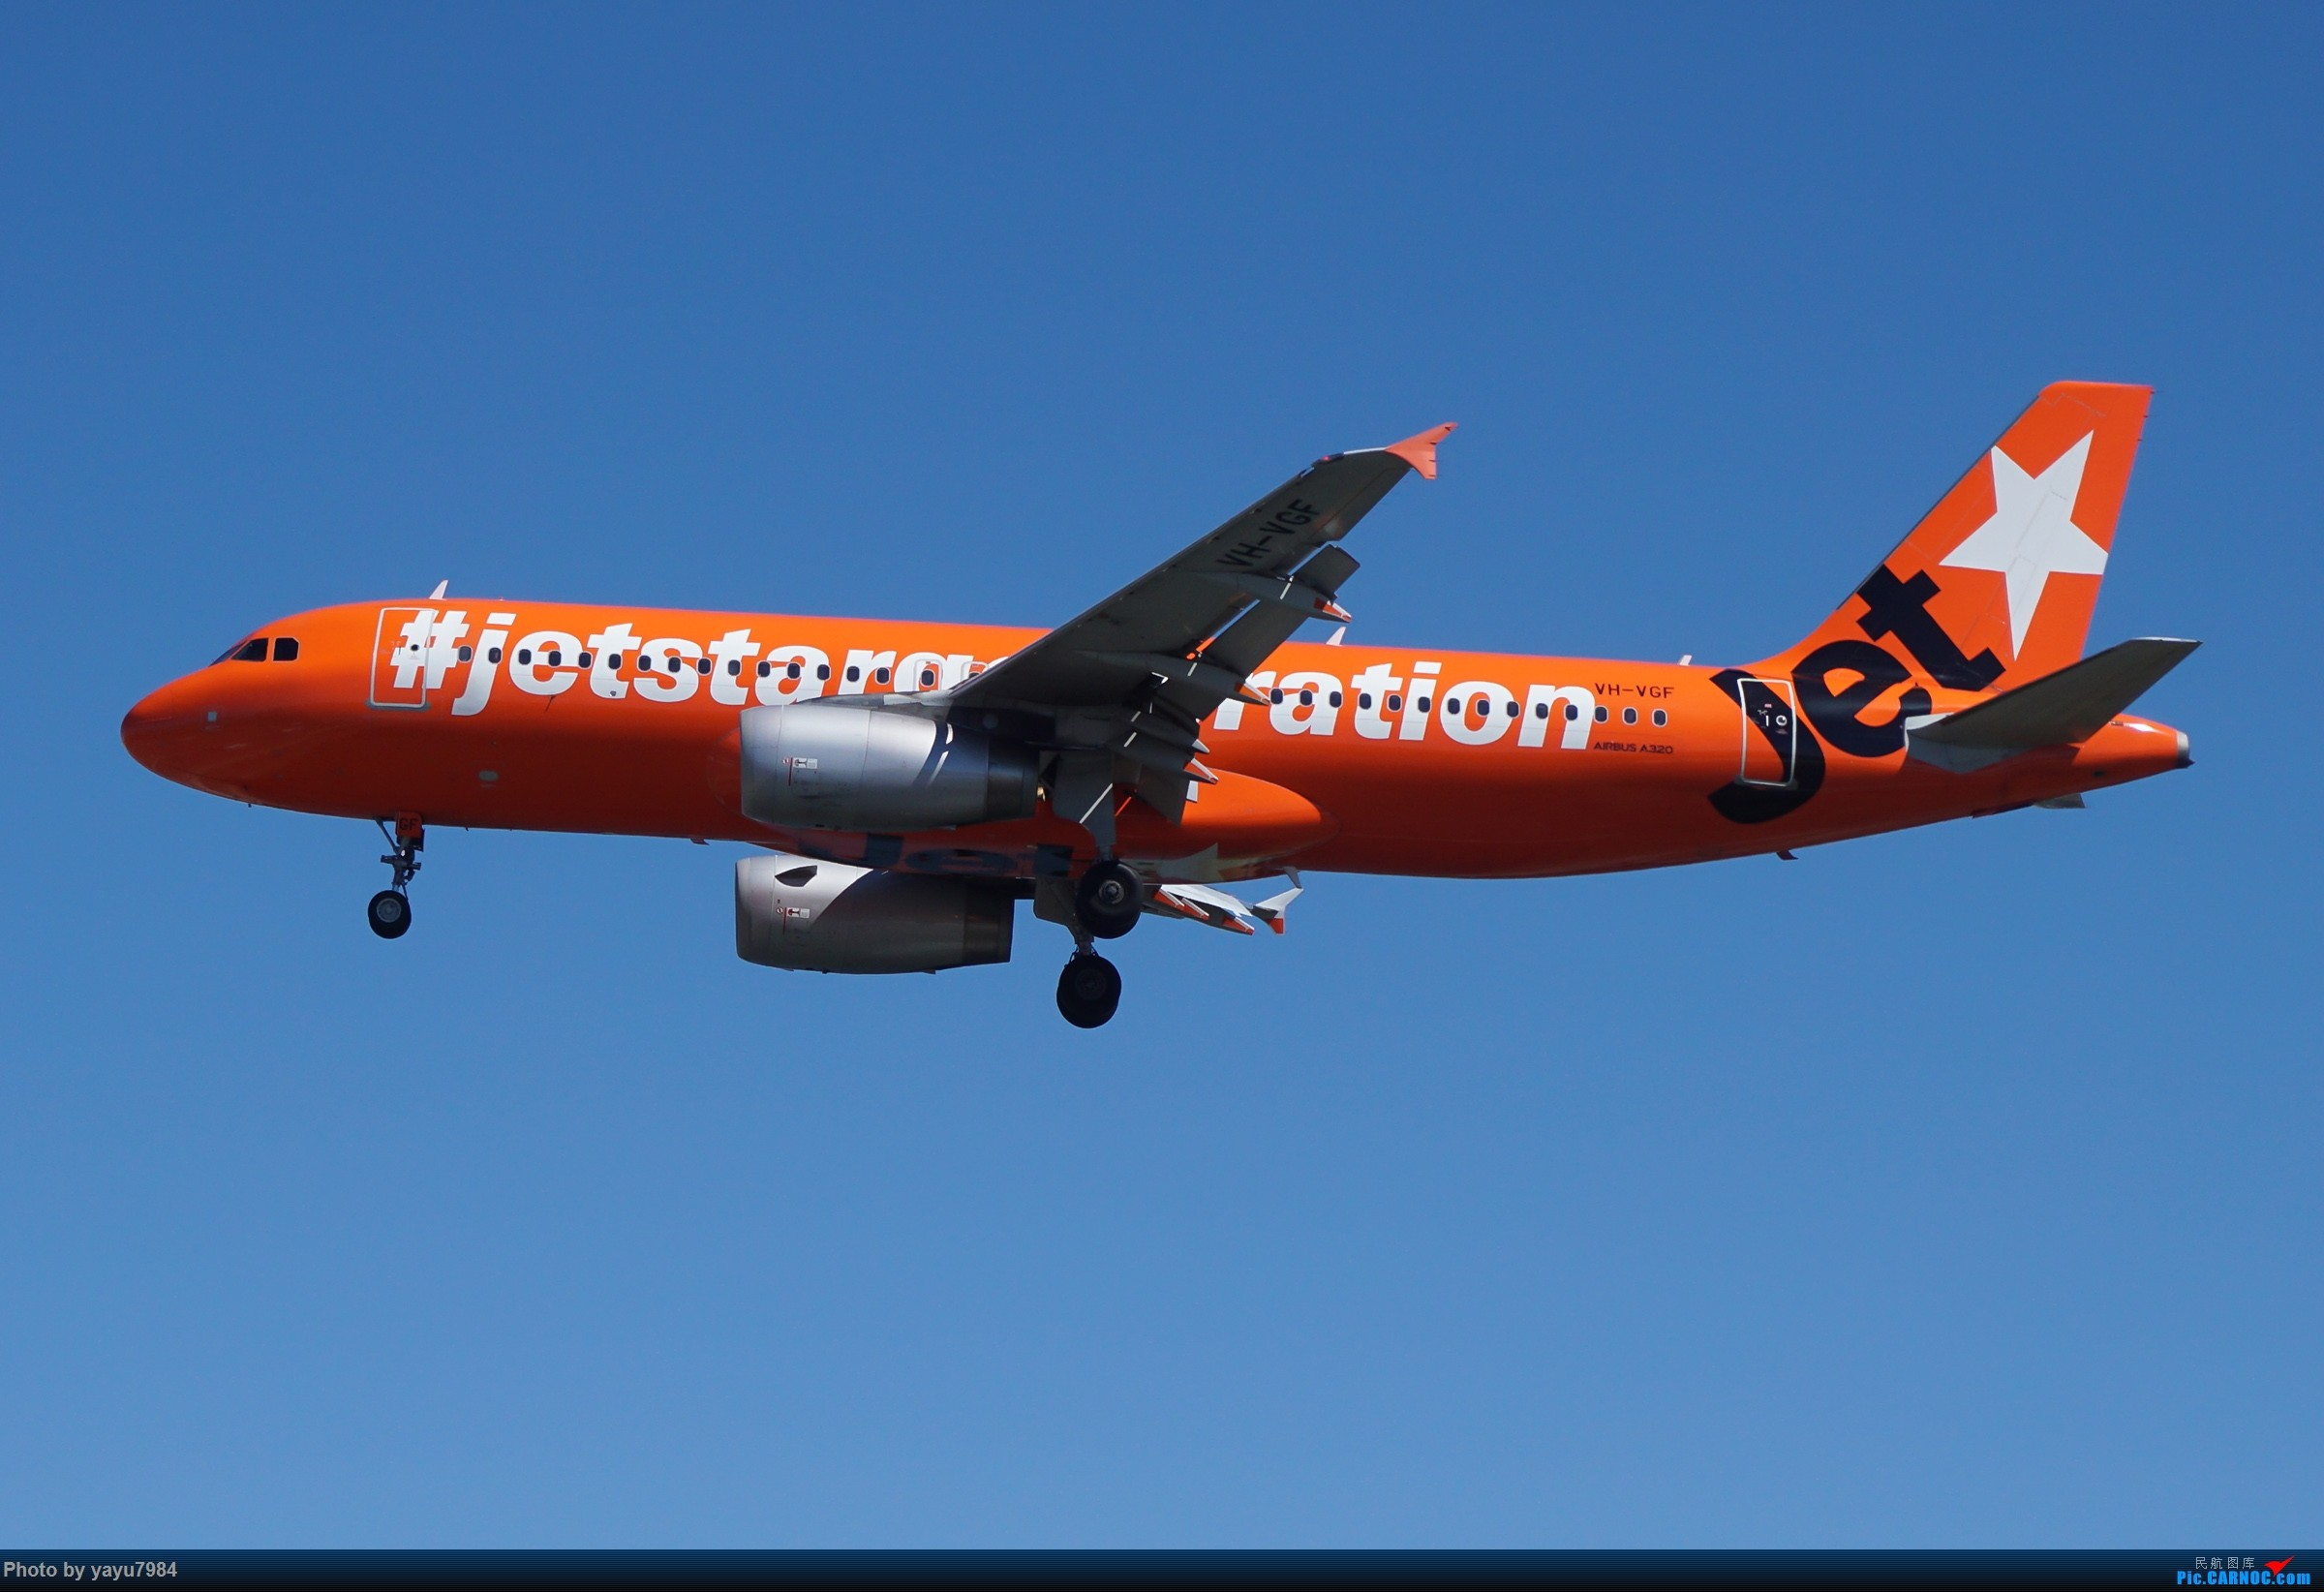 Re:[原创][SYD] 东航天合332,雪绒花343,华航蓝鹊,以及其他日常货 AIRBUS A320-200 VH-VGF 澳大利亚悉尼金斯福德·史密斯机场